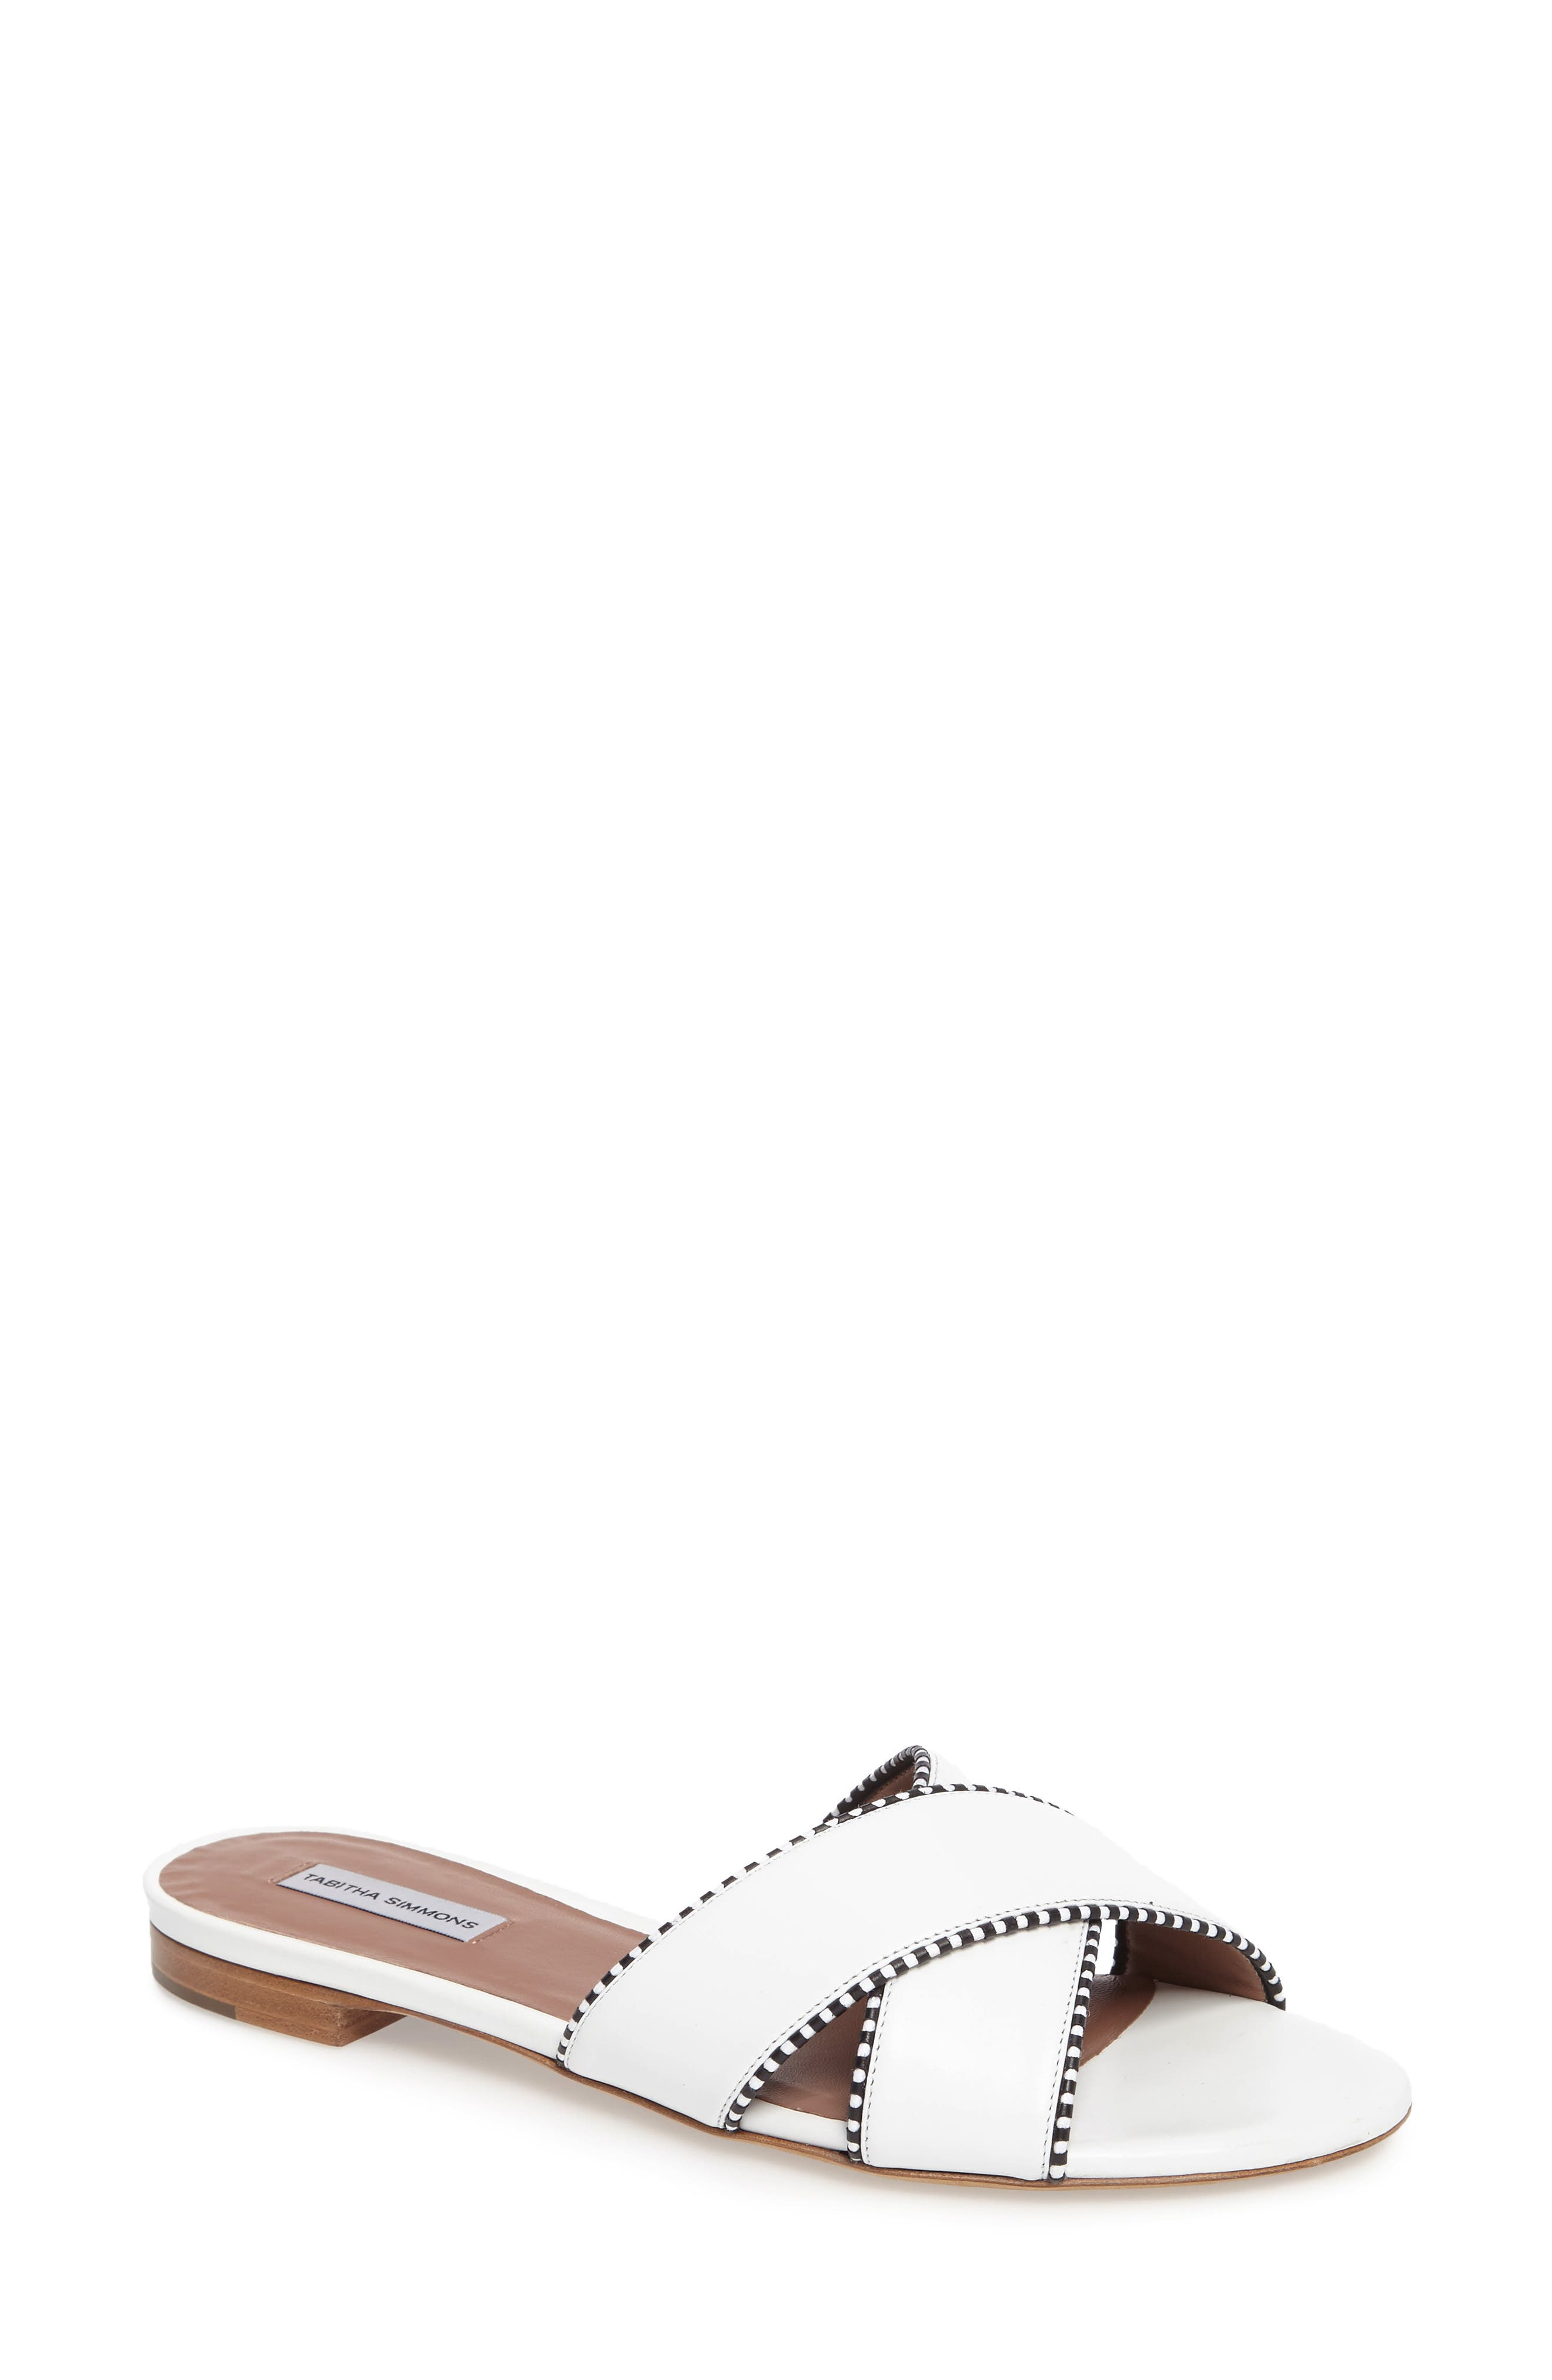 Lassie Profilo Slide Sandal,                         Main,                         color, 100